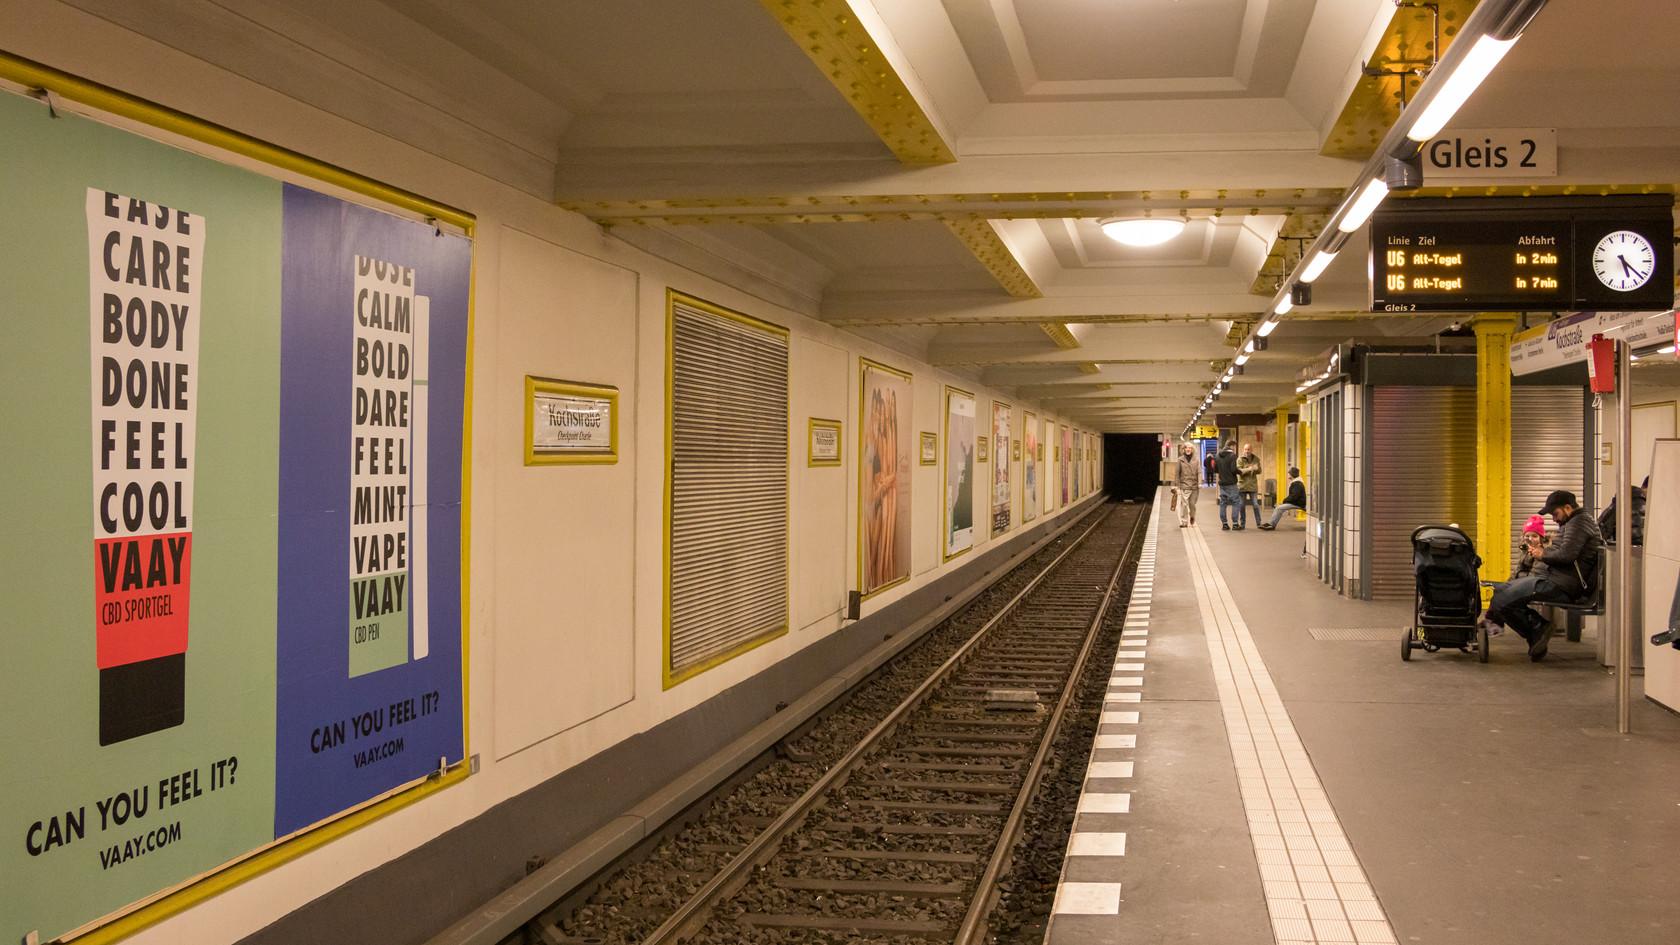 Station de Métro de Berlin